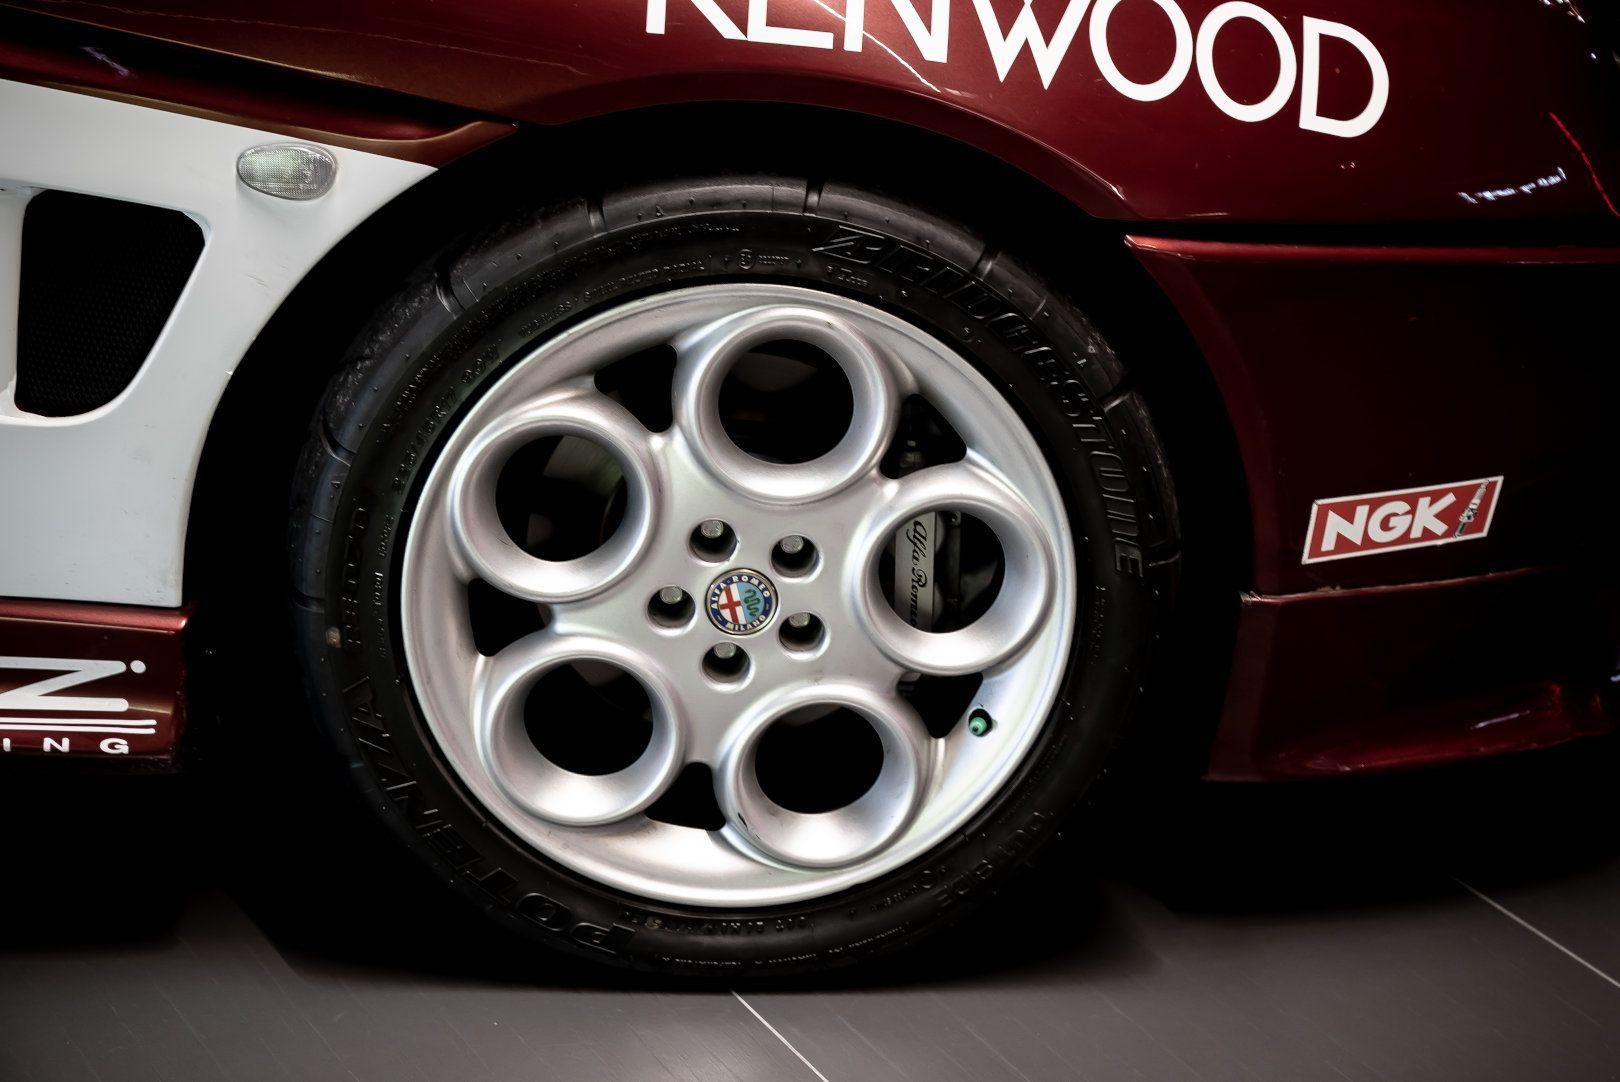 1995 Alfa Romeo GTV 2.0 V6 Turbo Cup Replica 57179